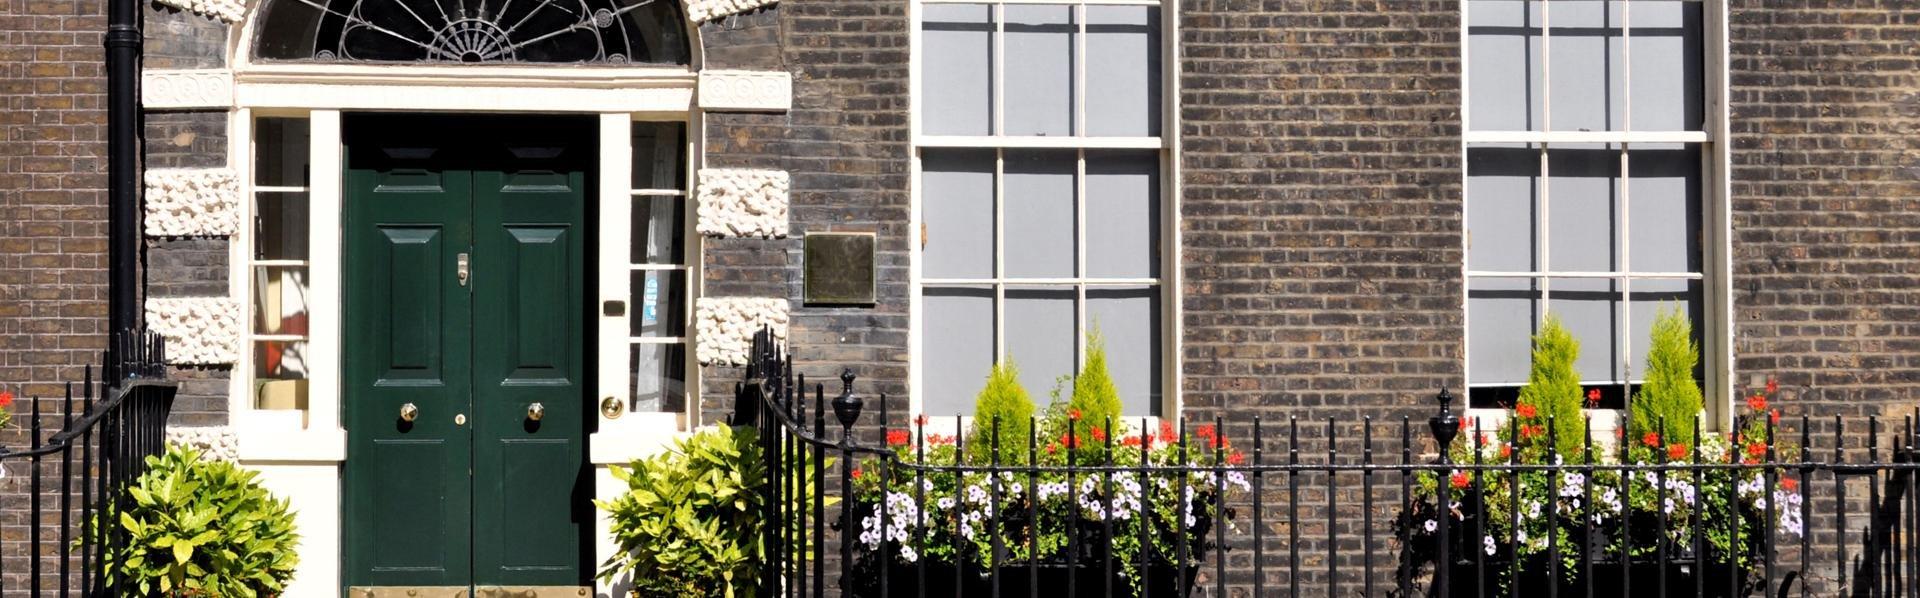 Bloomsbury in Londen, Groot-Brittannië